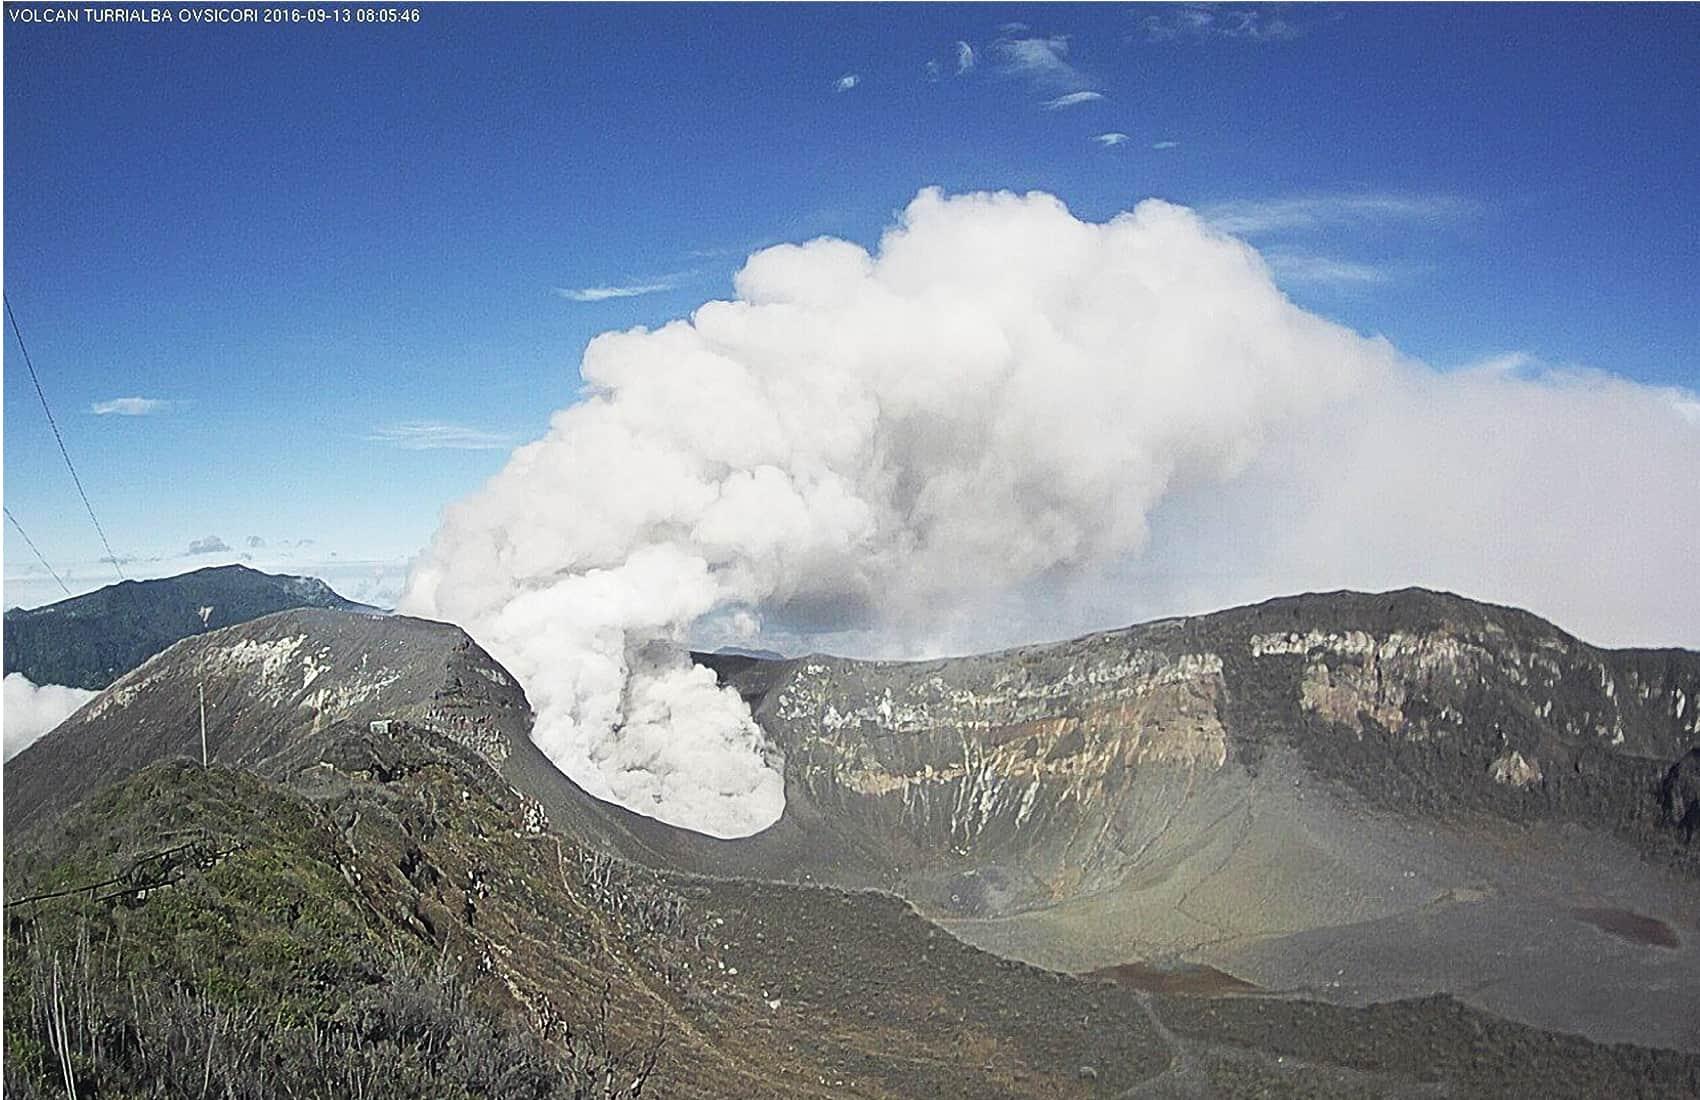 Turrialba Volcano explosion. Sept. 13, 2016.